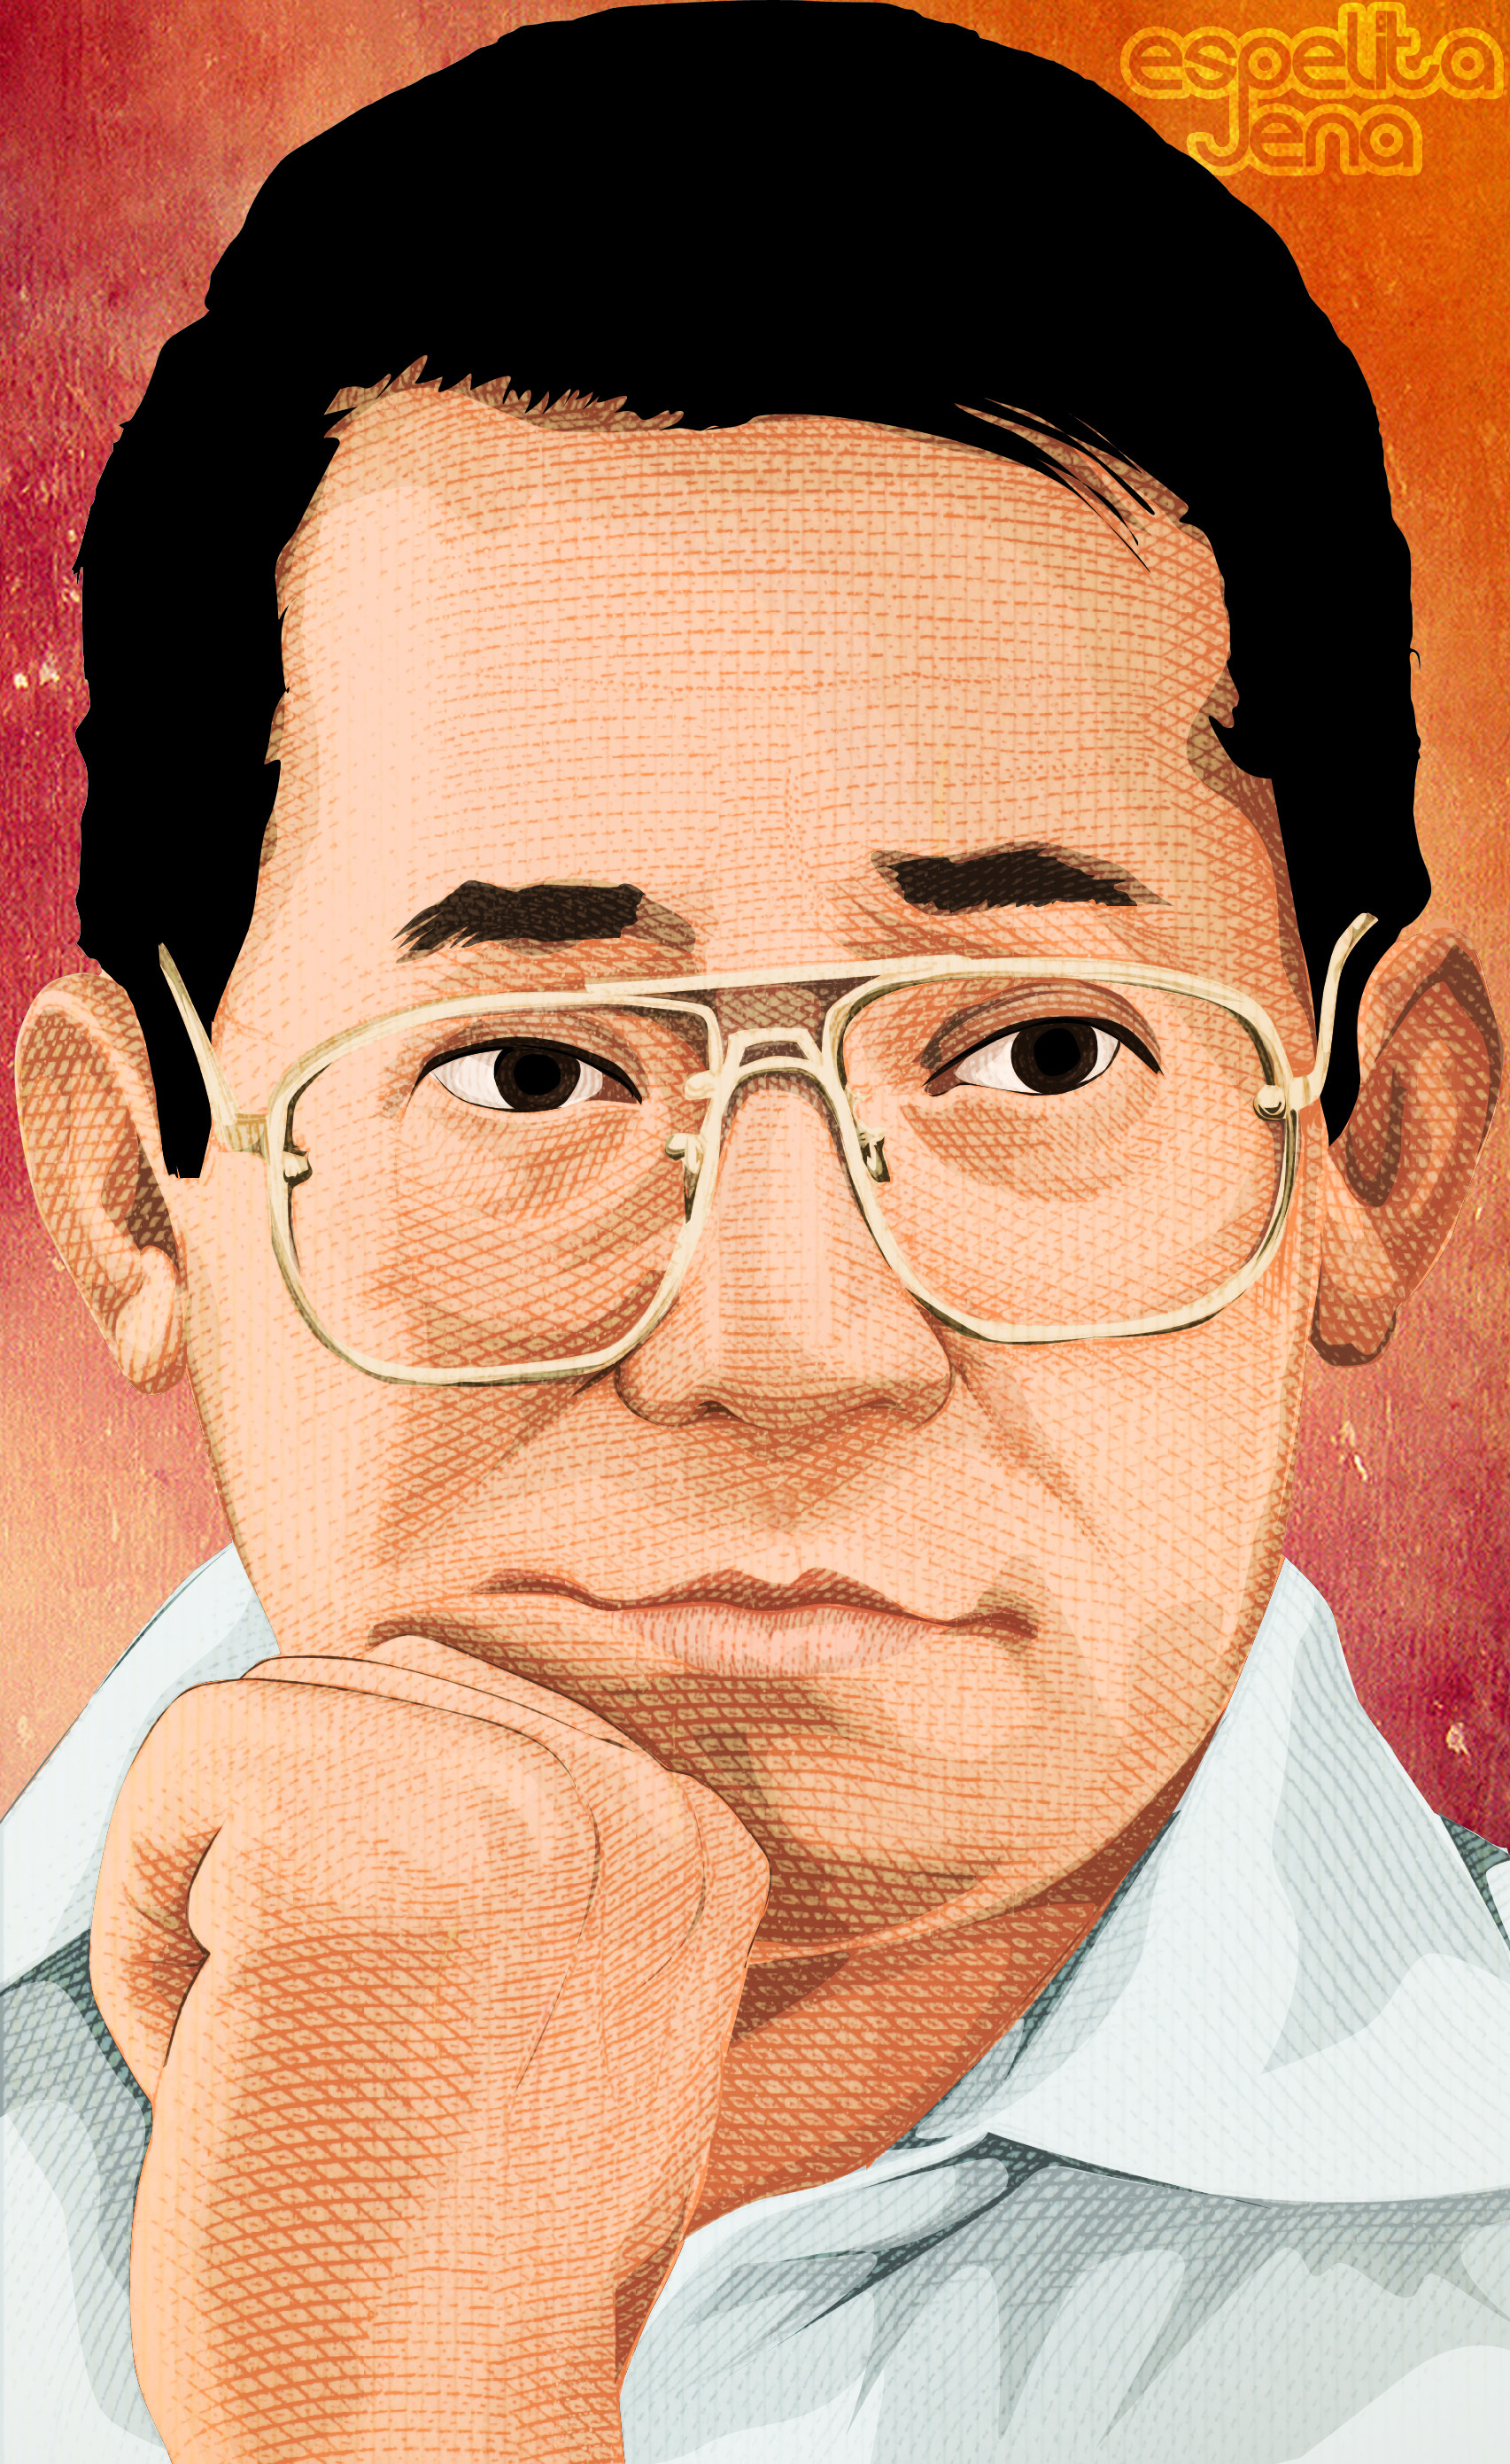 Benigno Aquino Iii Drawing Google Images Results